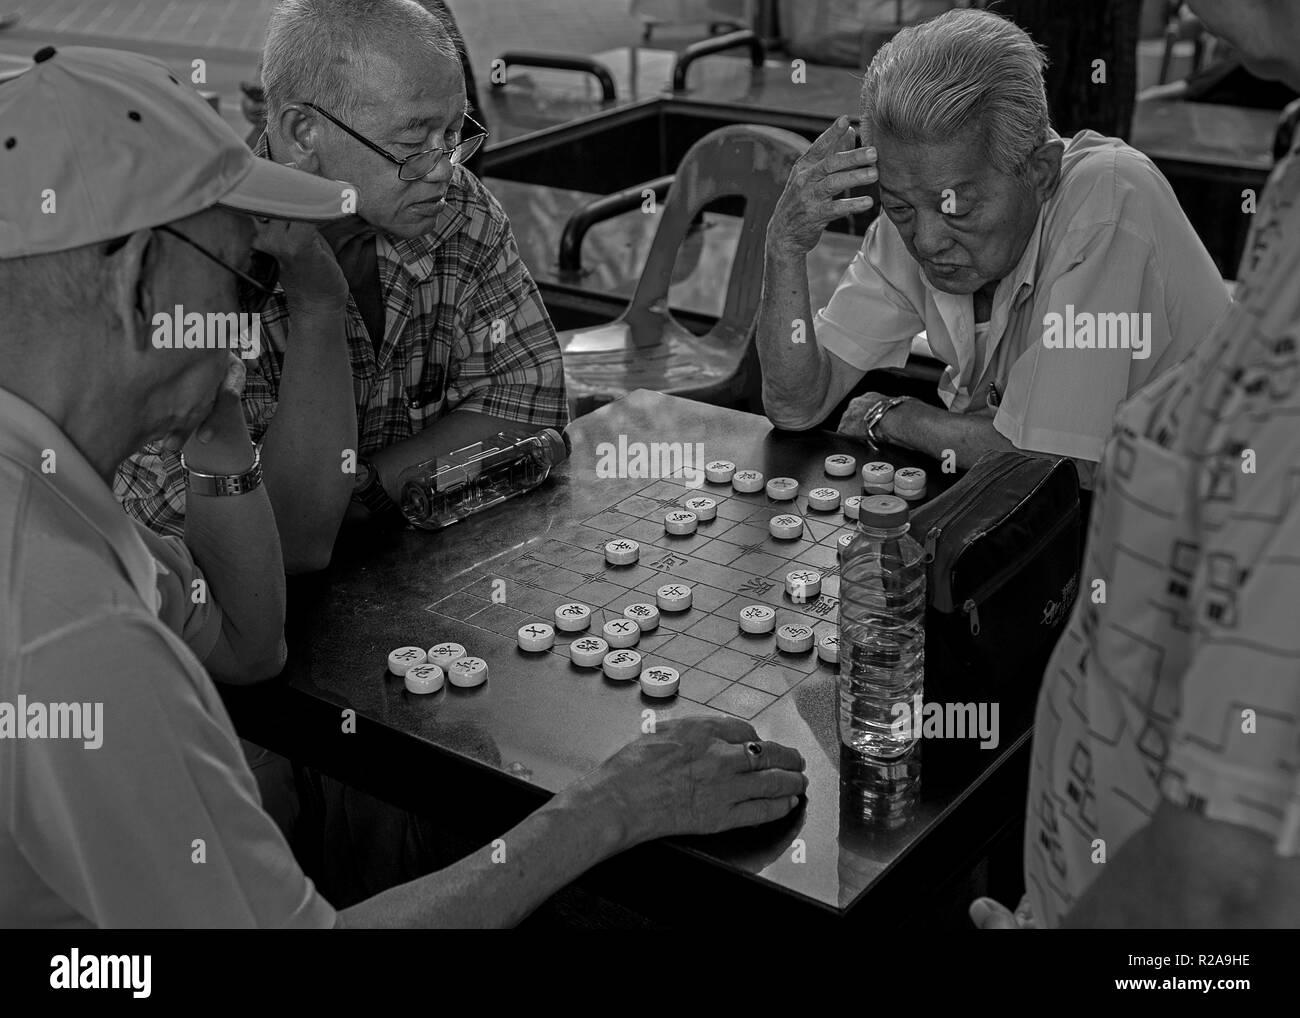 Chinese chess (xiangqi) played in Chinatown Singapore - Stock Image